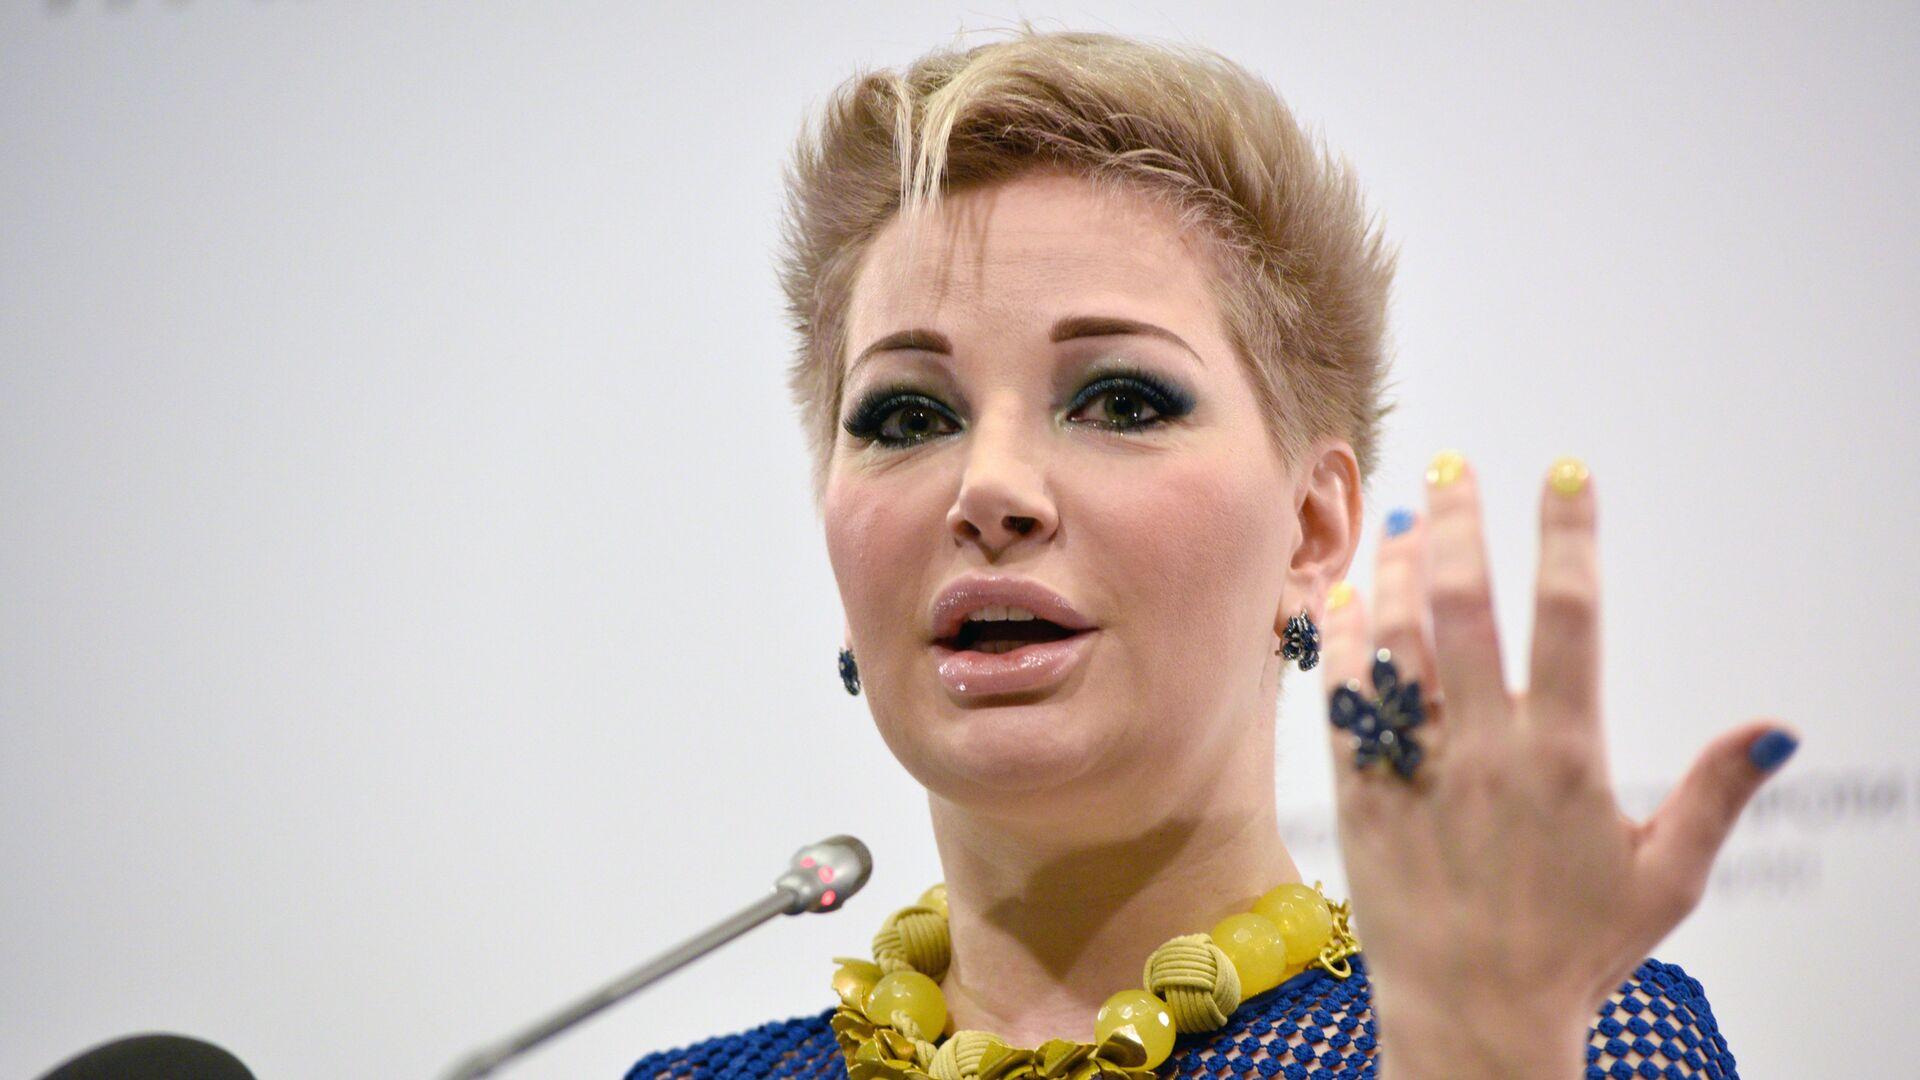 Оперная певица Мария Максакова - РИА Новости, 1920, 02.02.2021